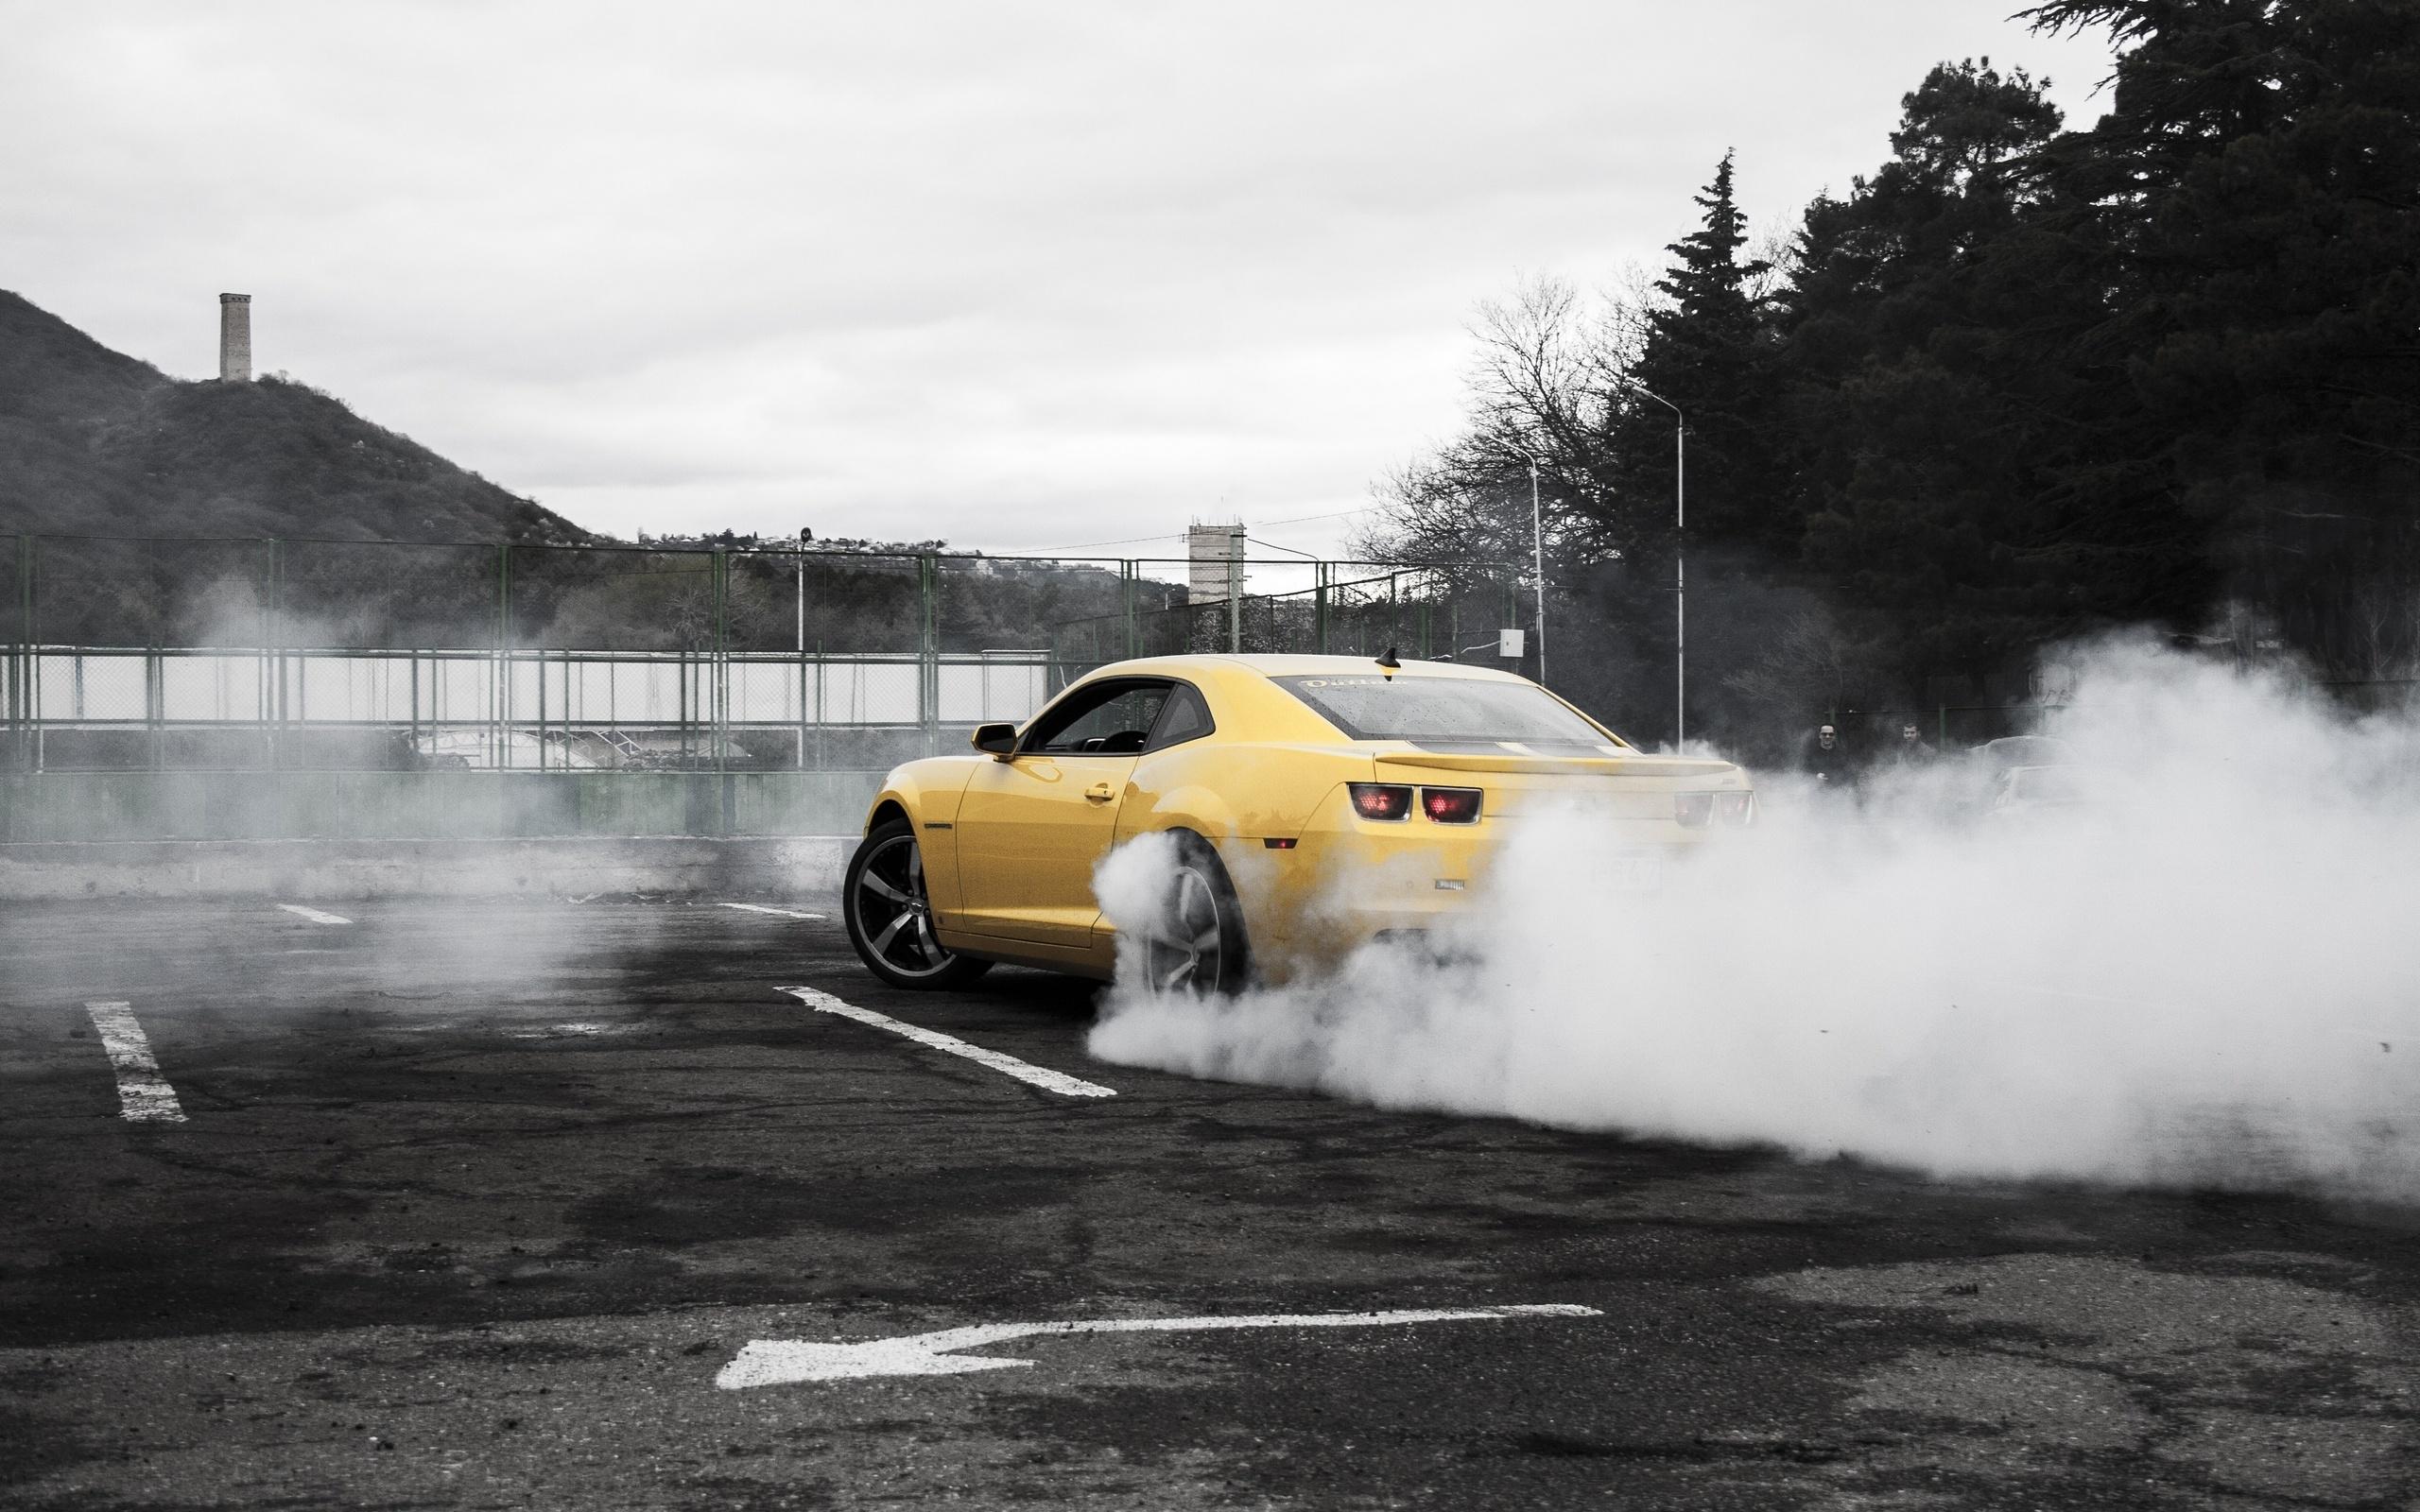 chevrolet amarillo coches pantalla camaro wallpaper fondos svetik es de descargar